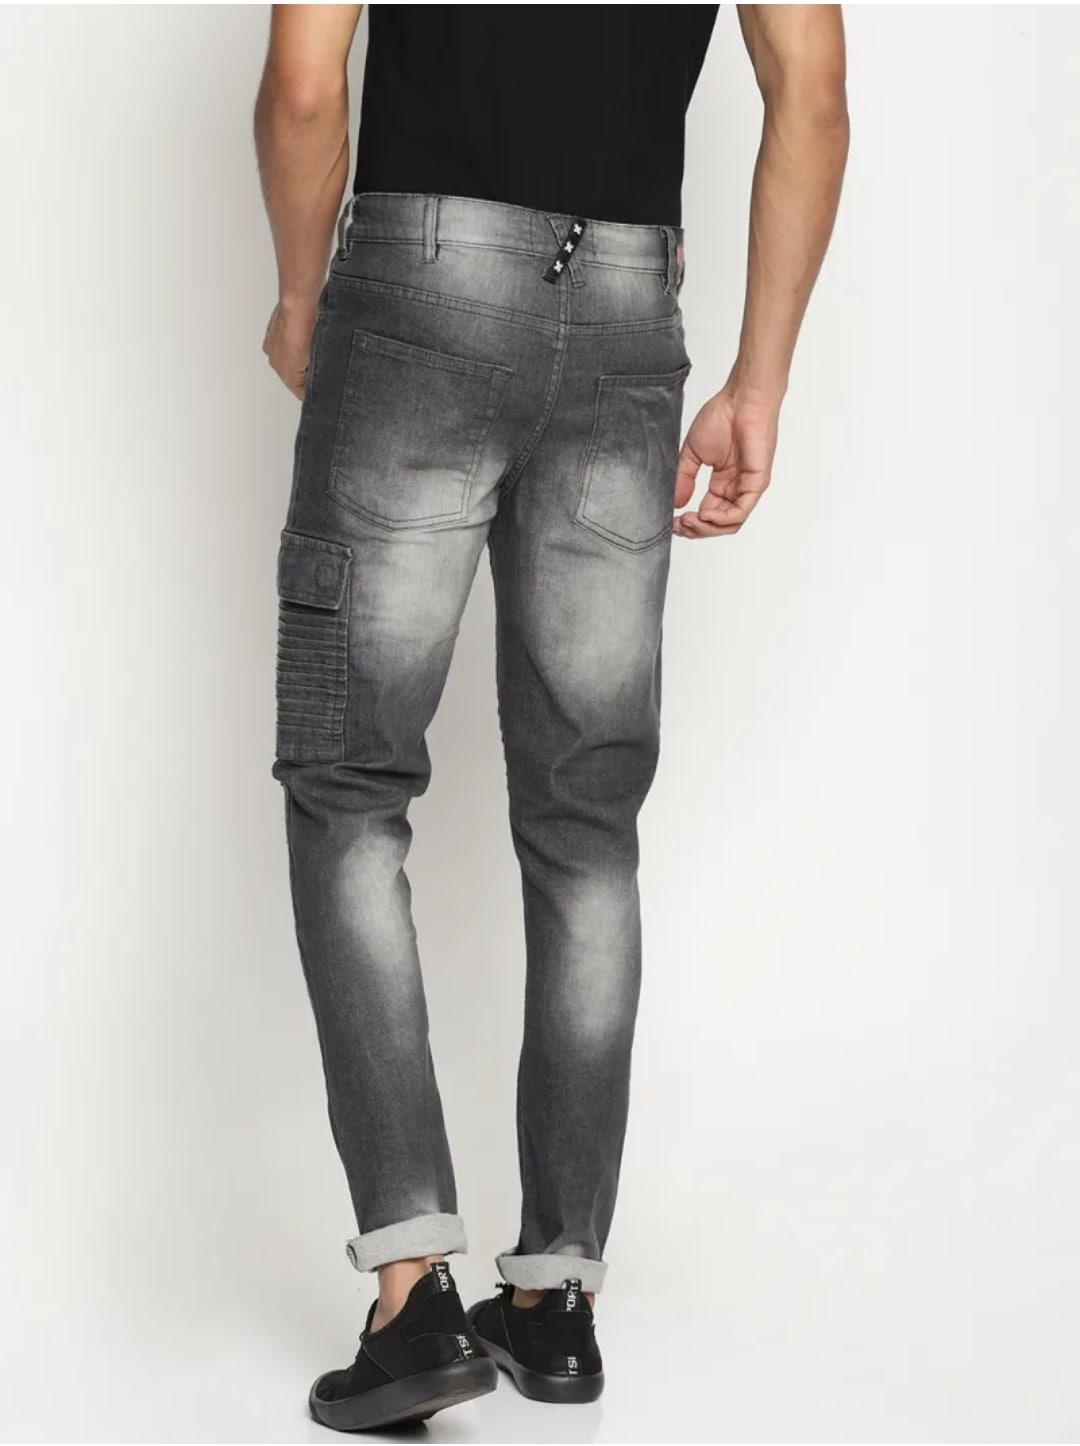 Men's Biker Gray Jeans (34,Gray)